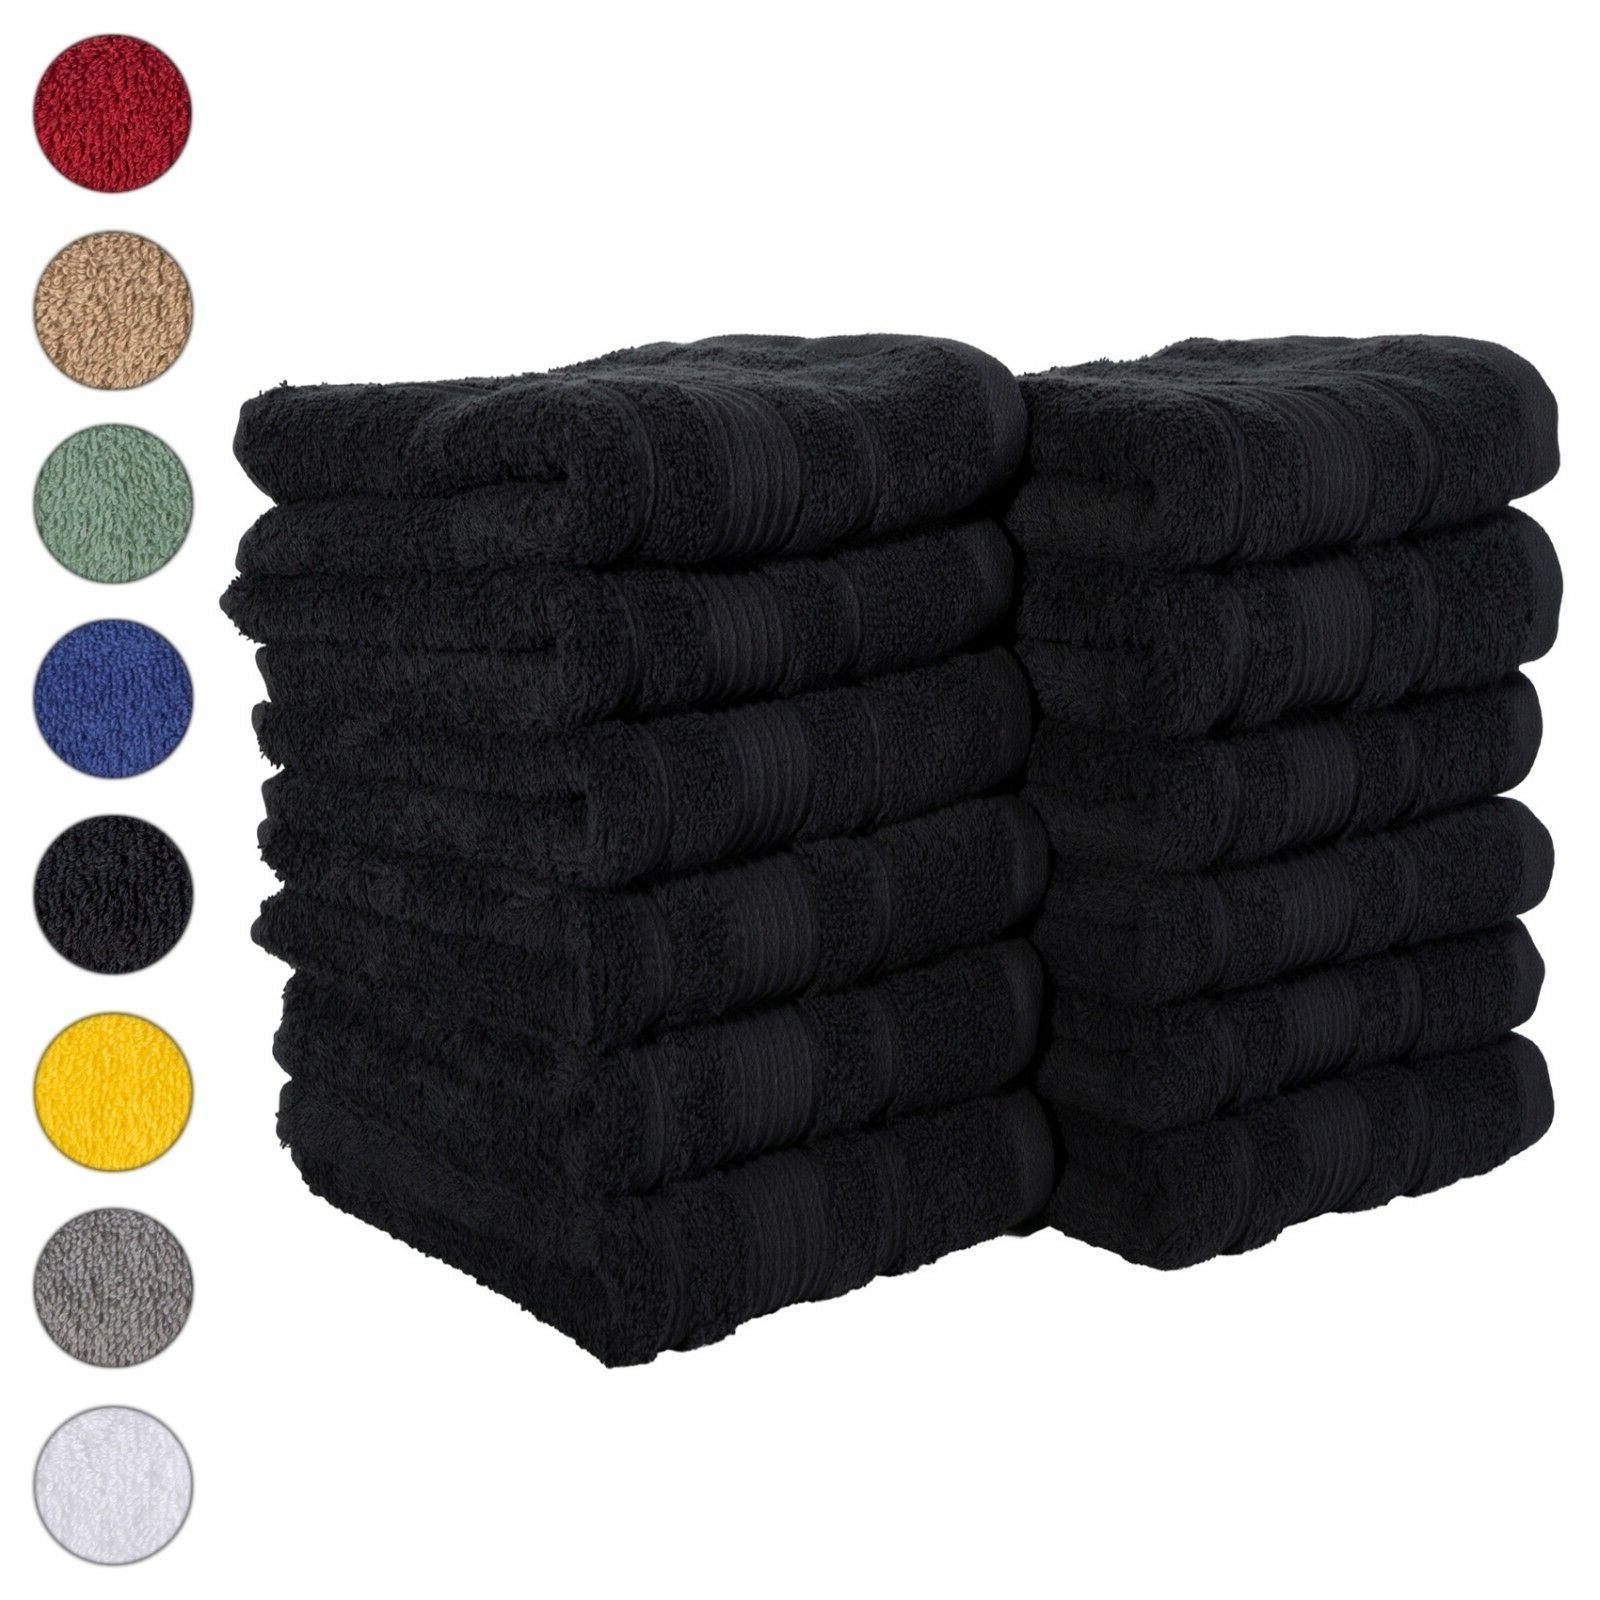 new black color ultra super soft luxury